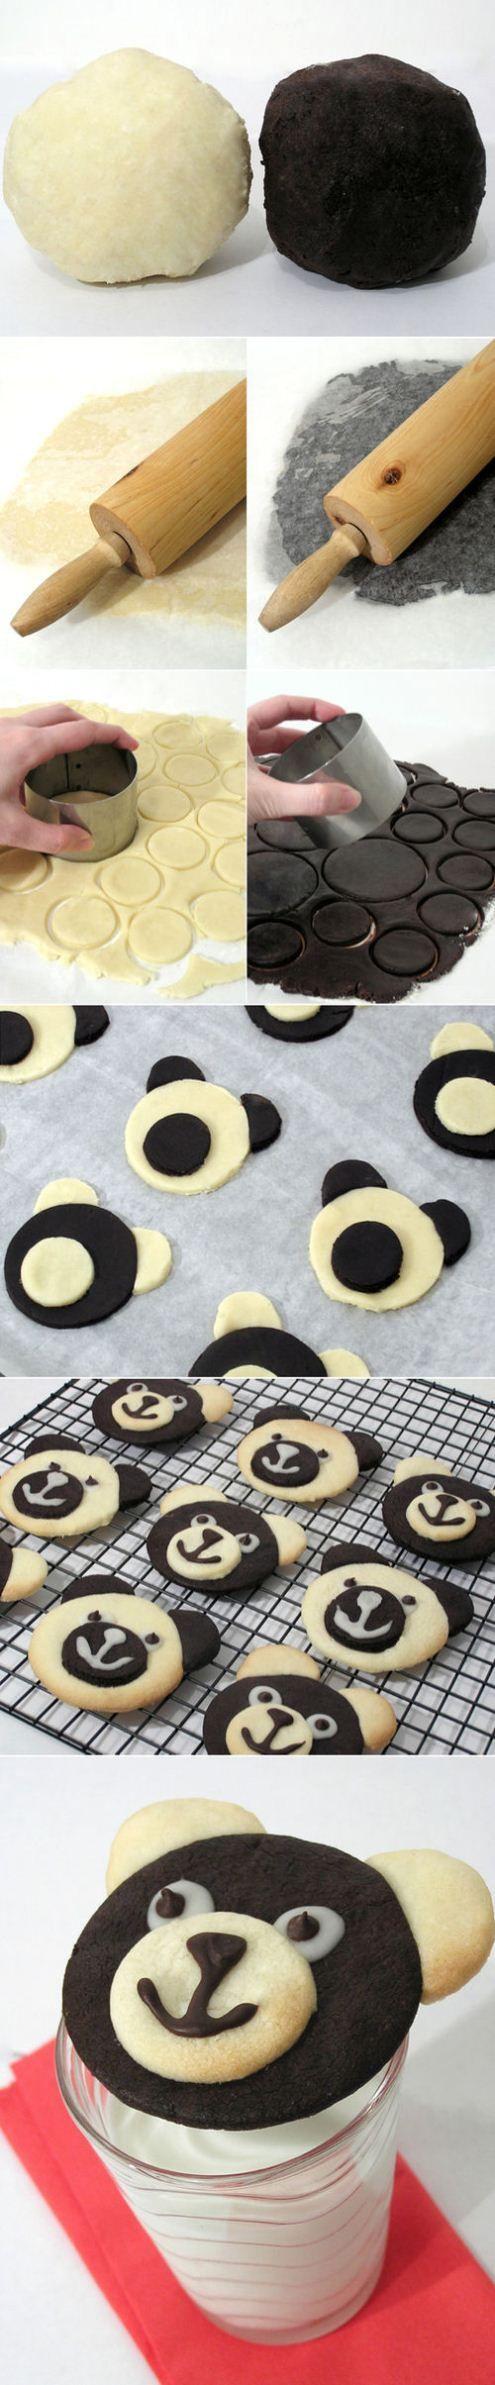 dobra ideja za kolačiće